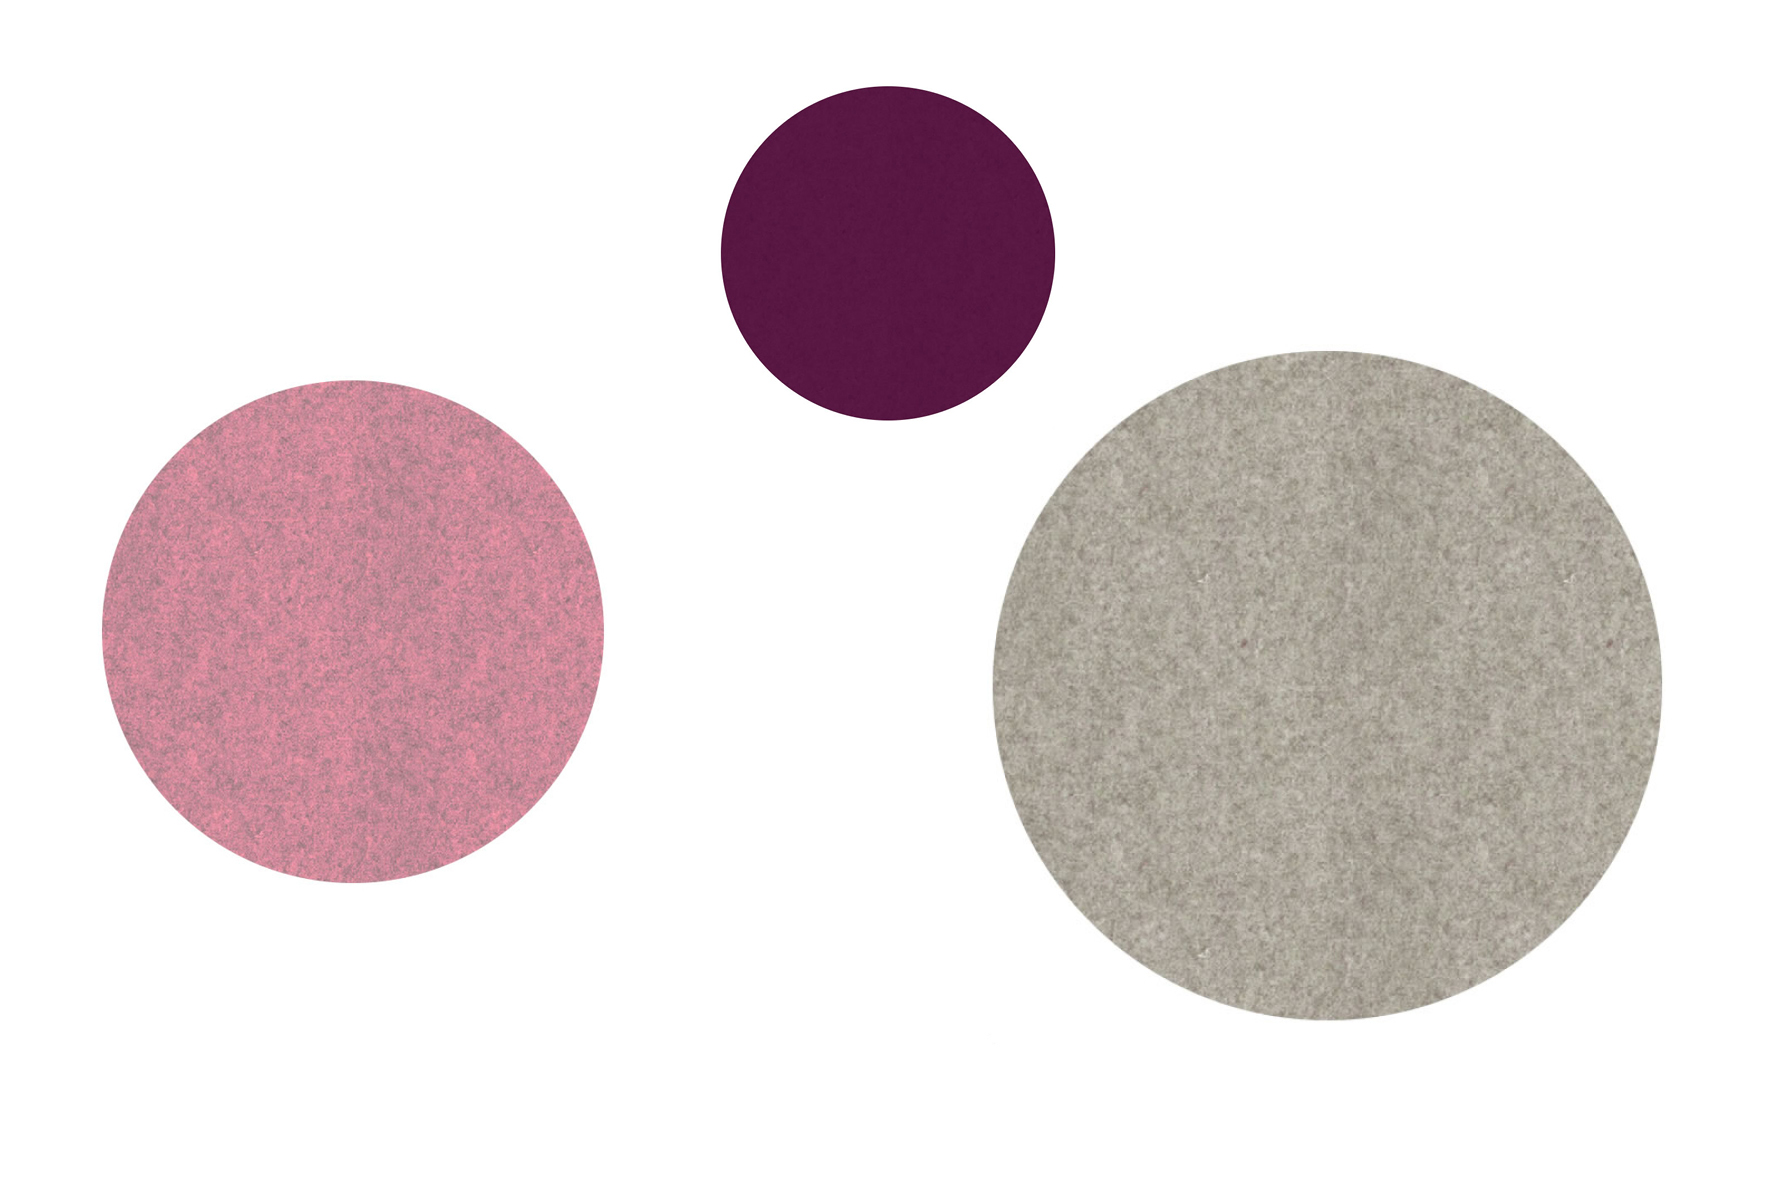 Filz-Pinnwand Dot Farbkombinationen